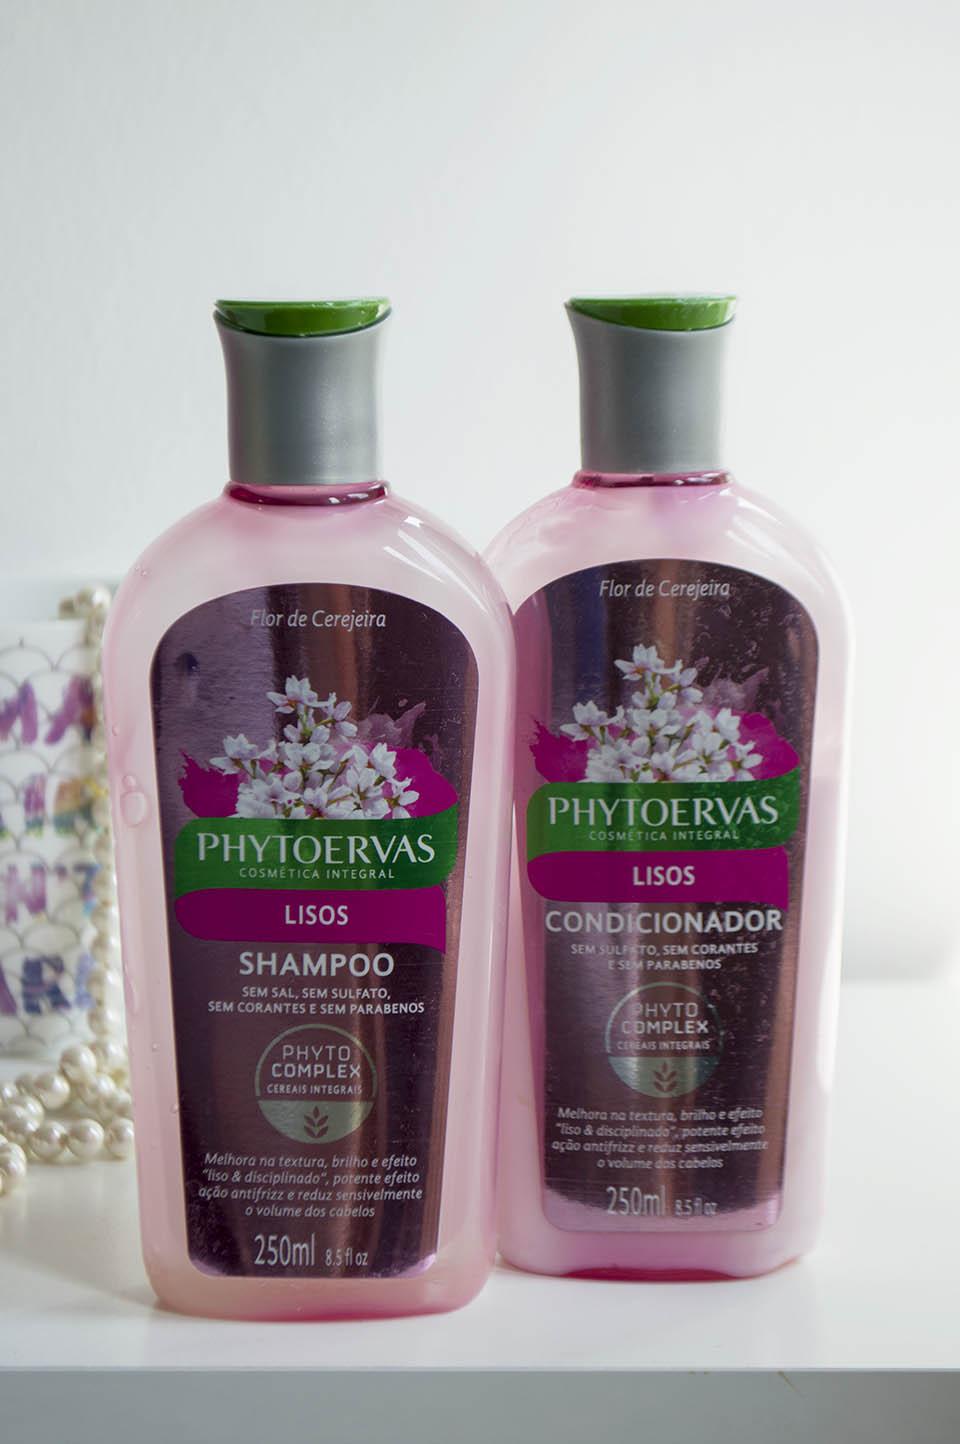 Shampoo Phytoervas para cabelo liso